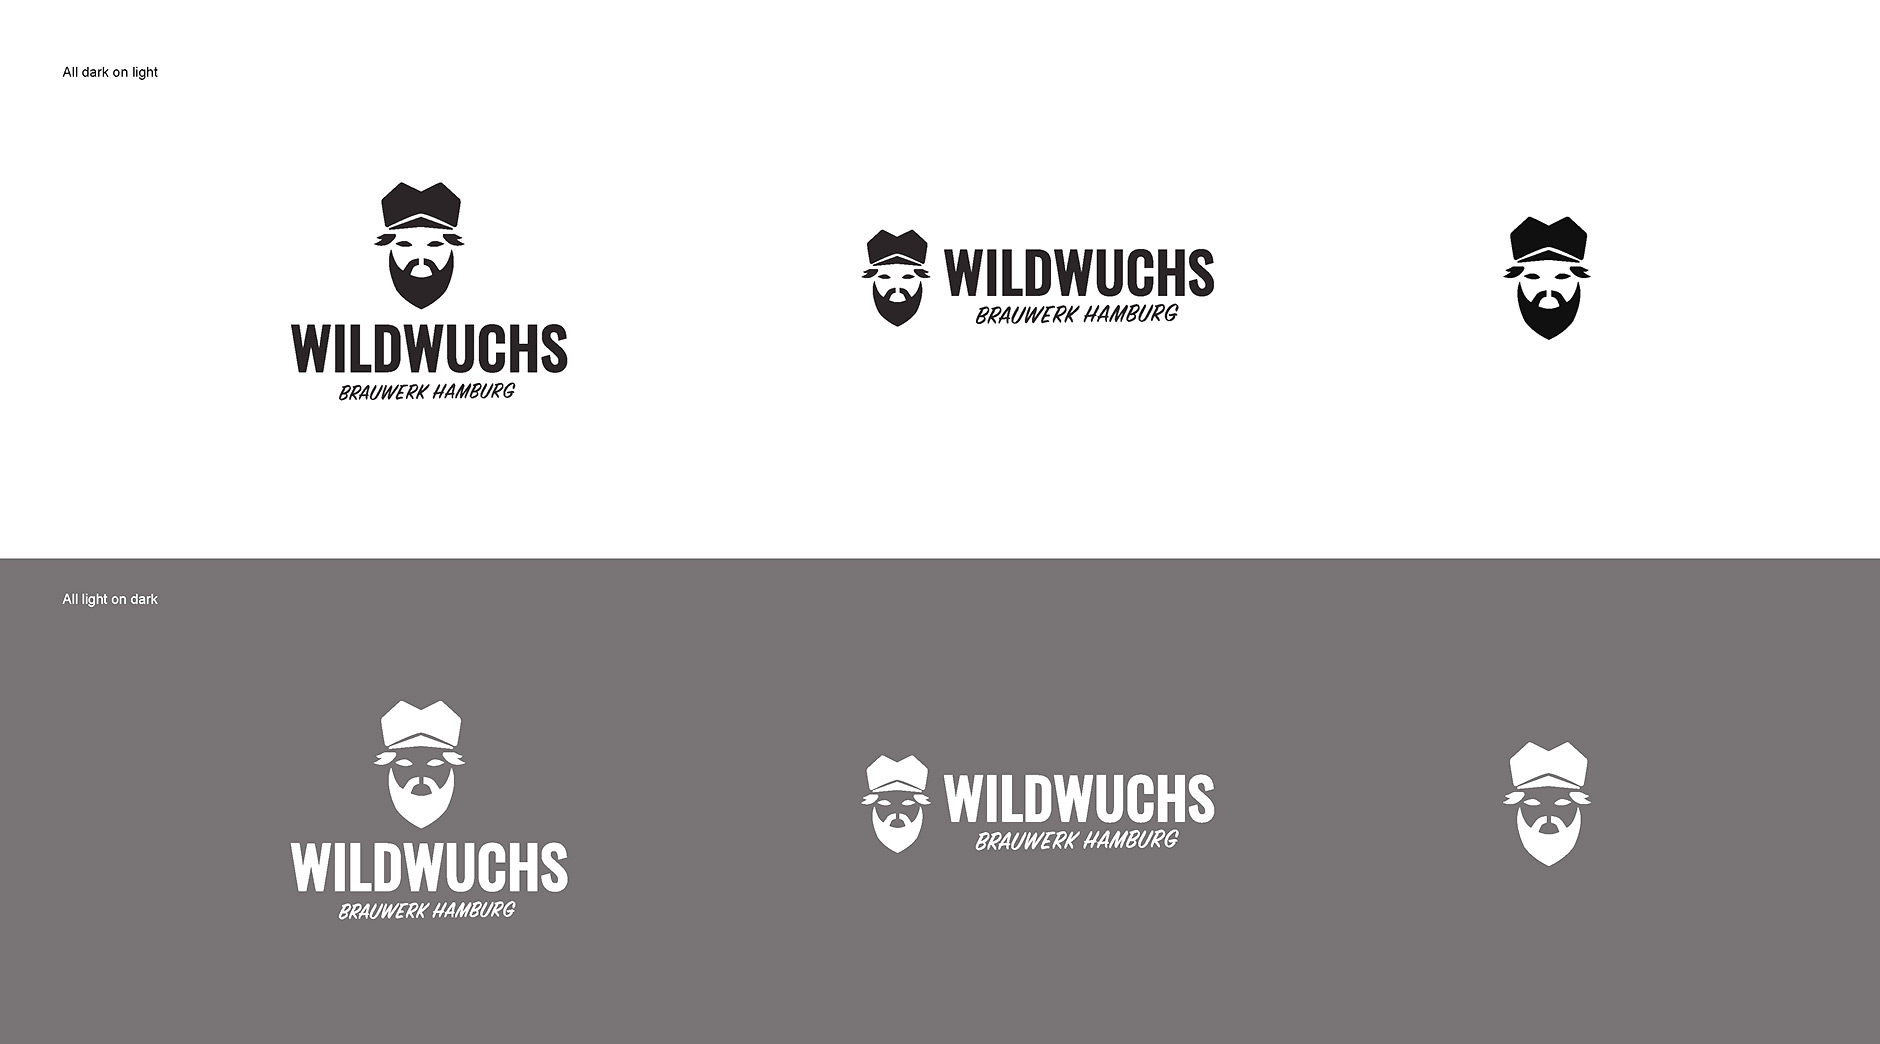 notfrombrooklyn › Wildwuchs